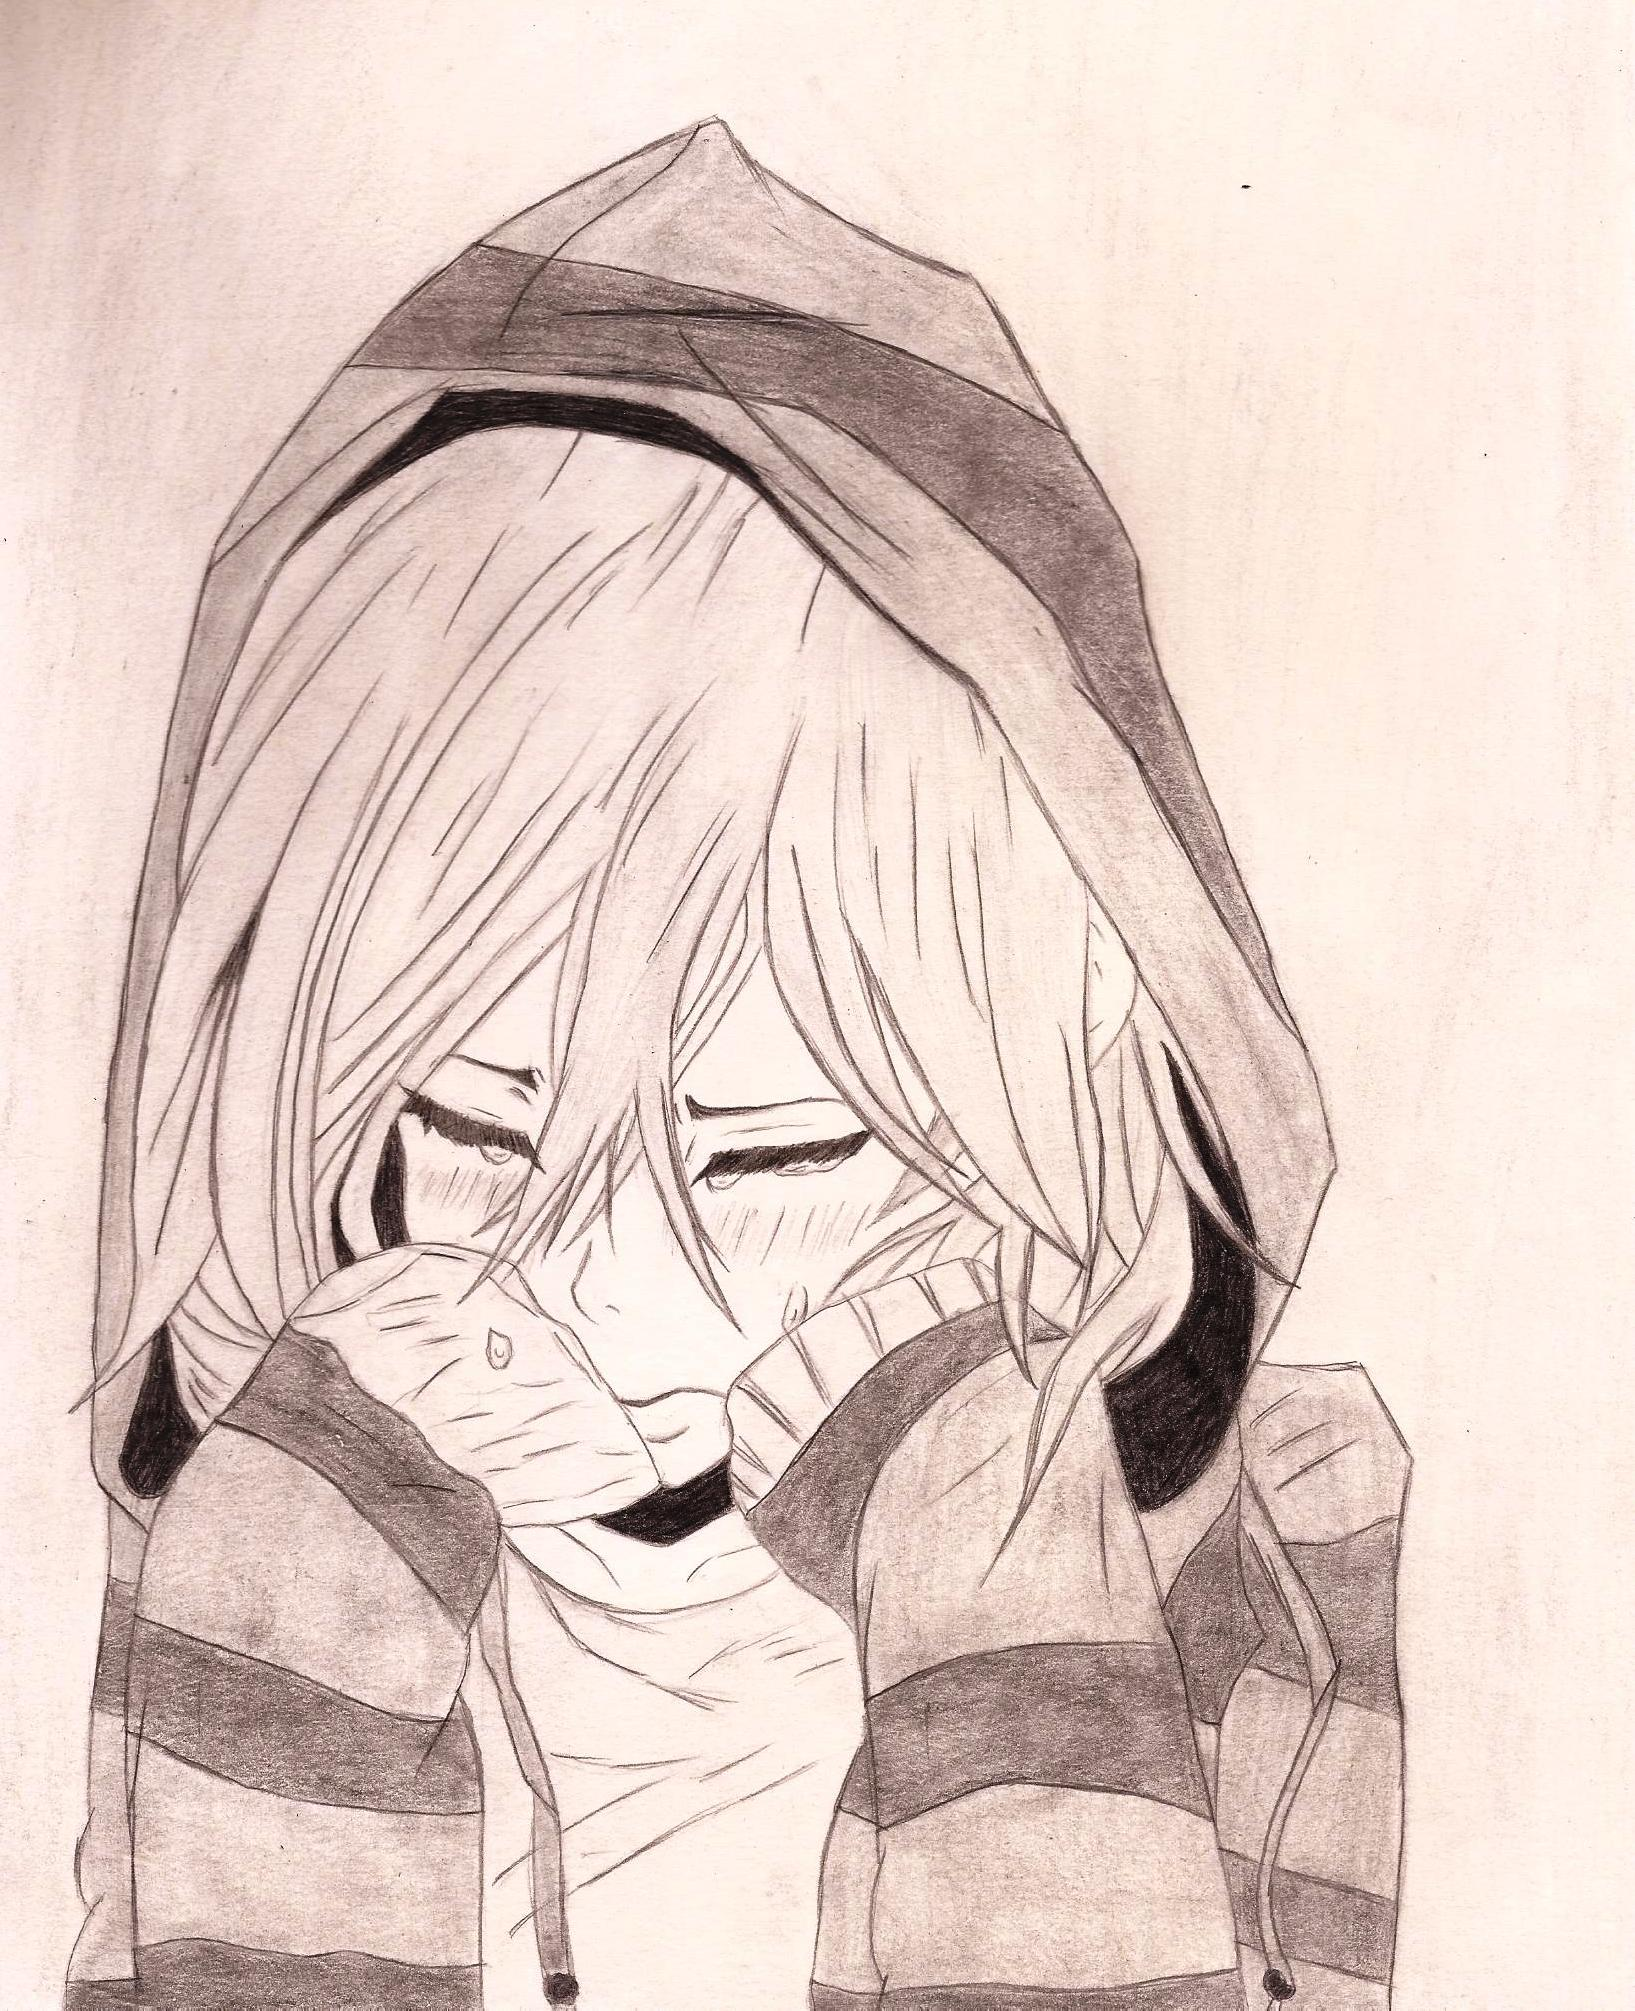 Sad Anime Drawing At GetDrawings